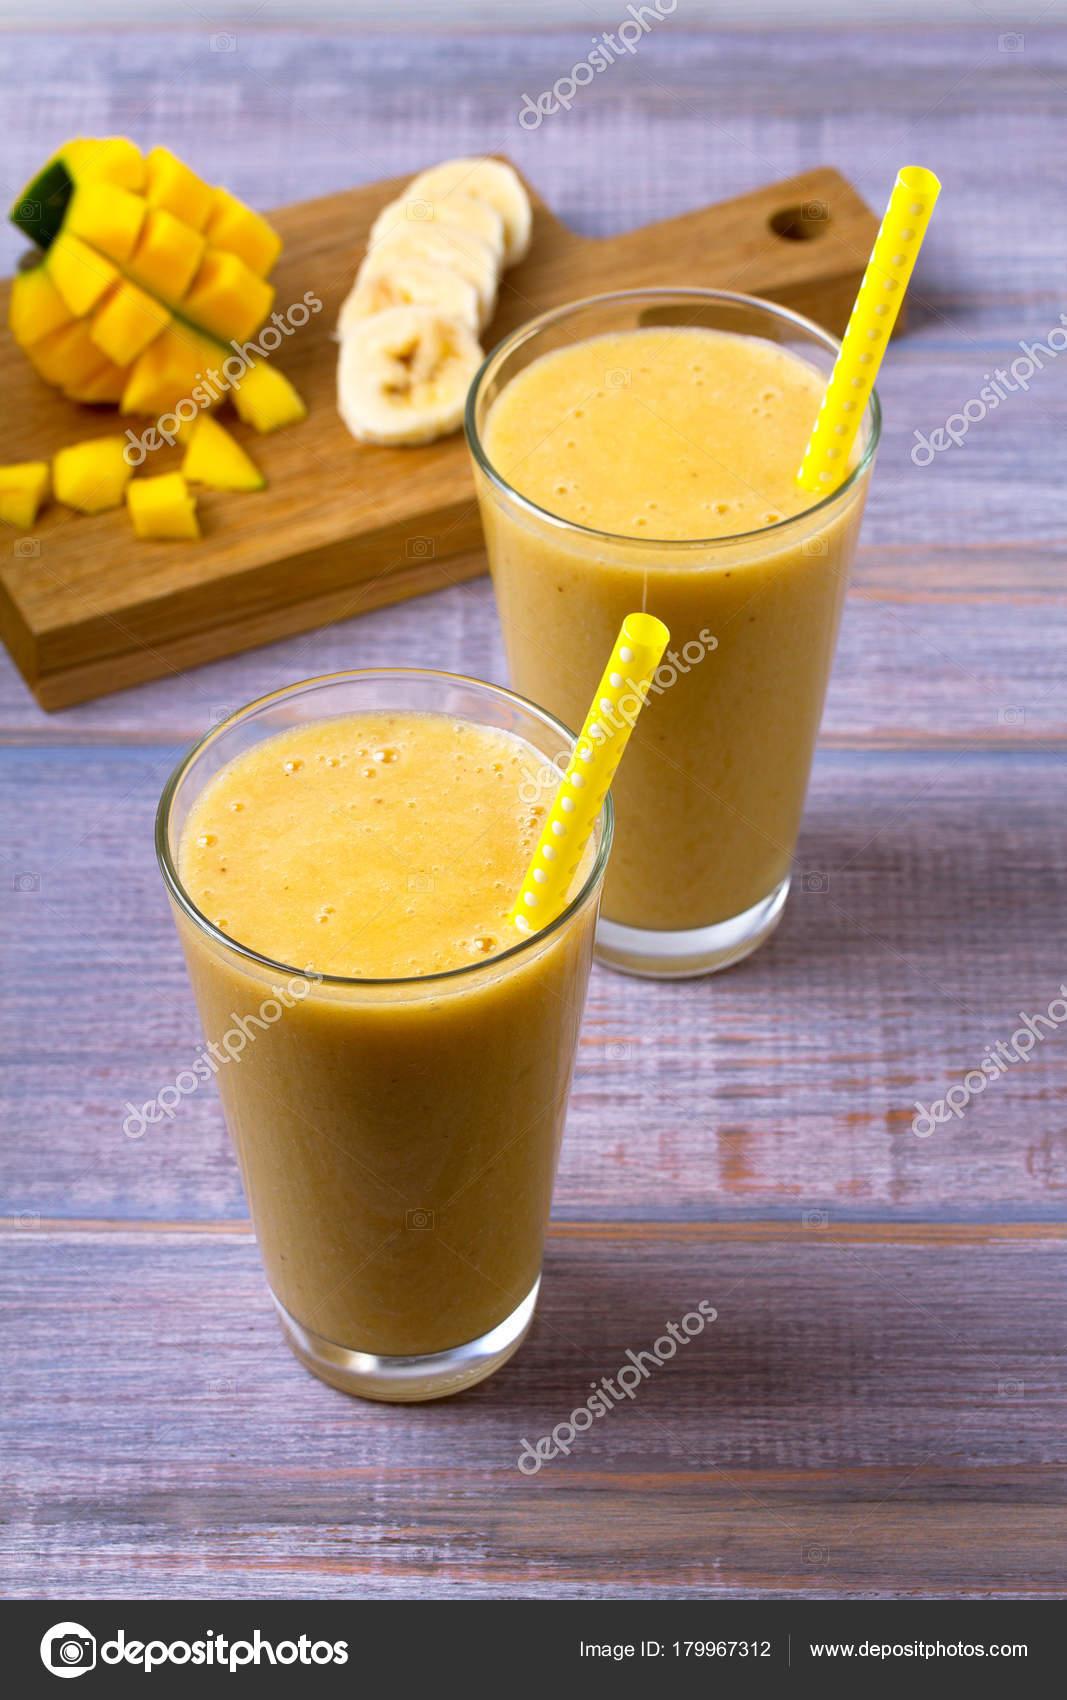 banan och mango smoothie